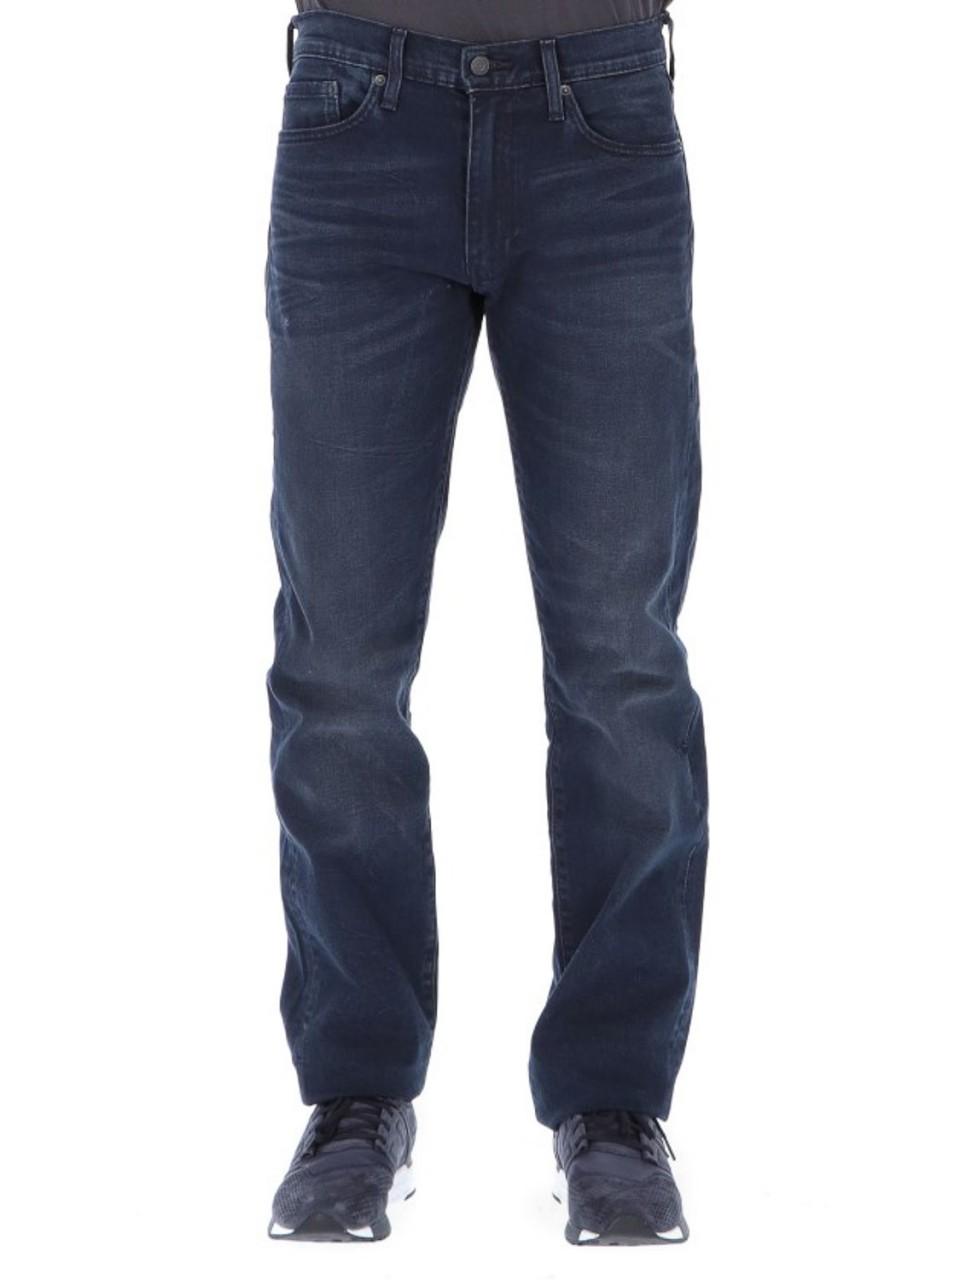 Levi's Uomo Jeans Levi's Uomo 501 Sponge Levis Original Fit L 34 5012698I